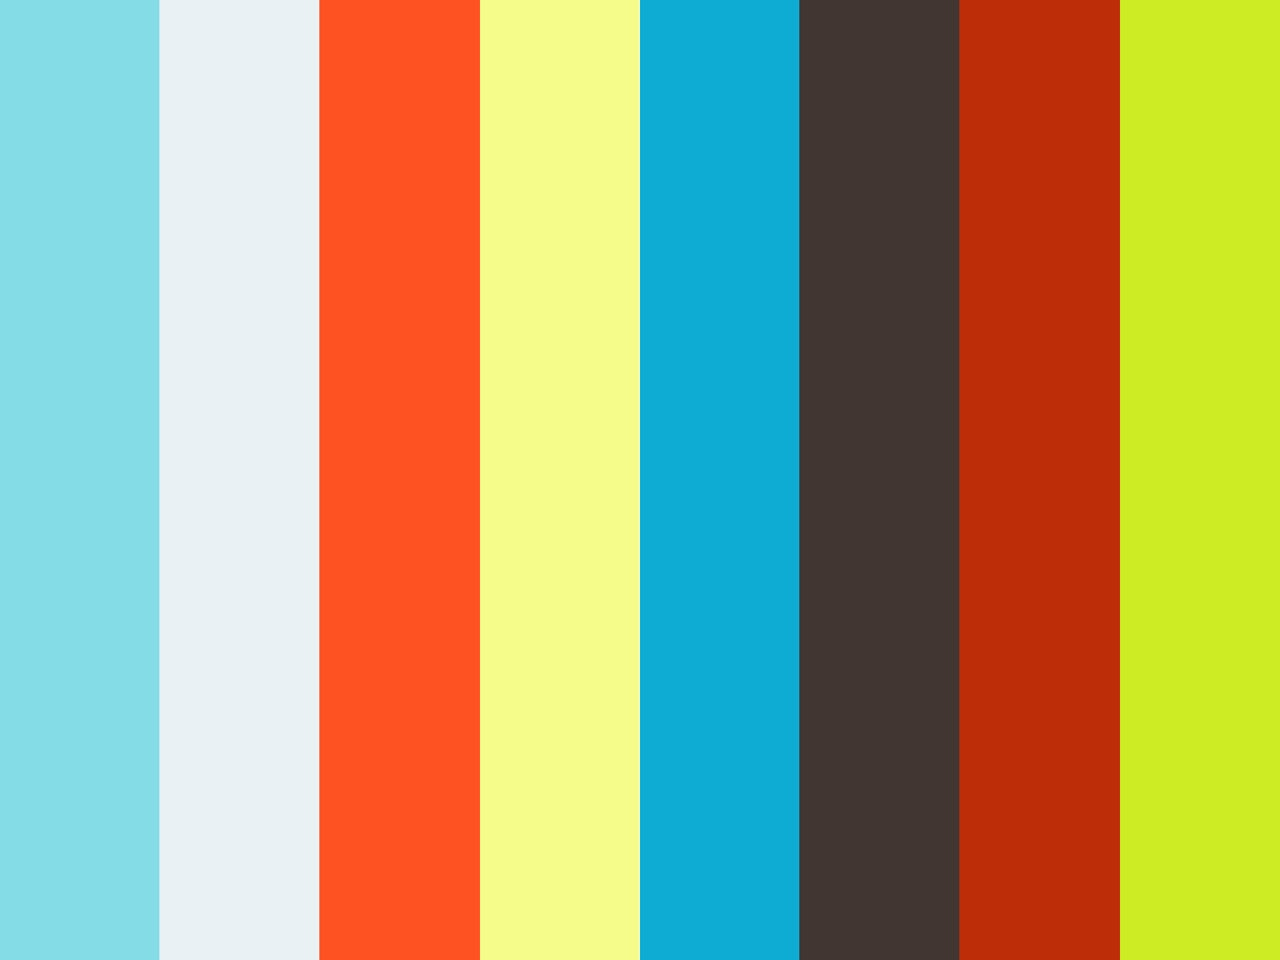 Bud Light - Bud Lights for Everyone [720p]